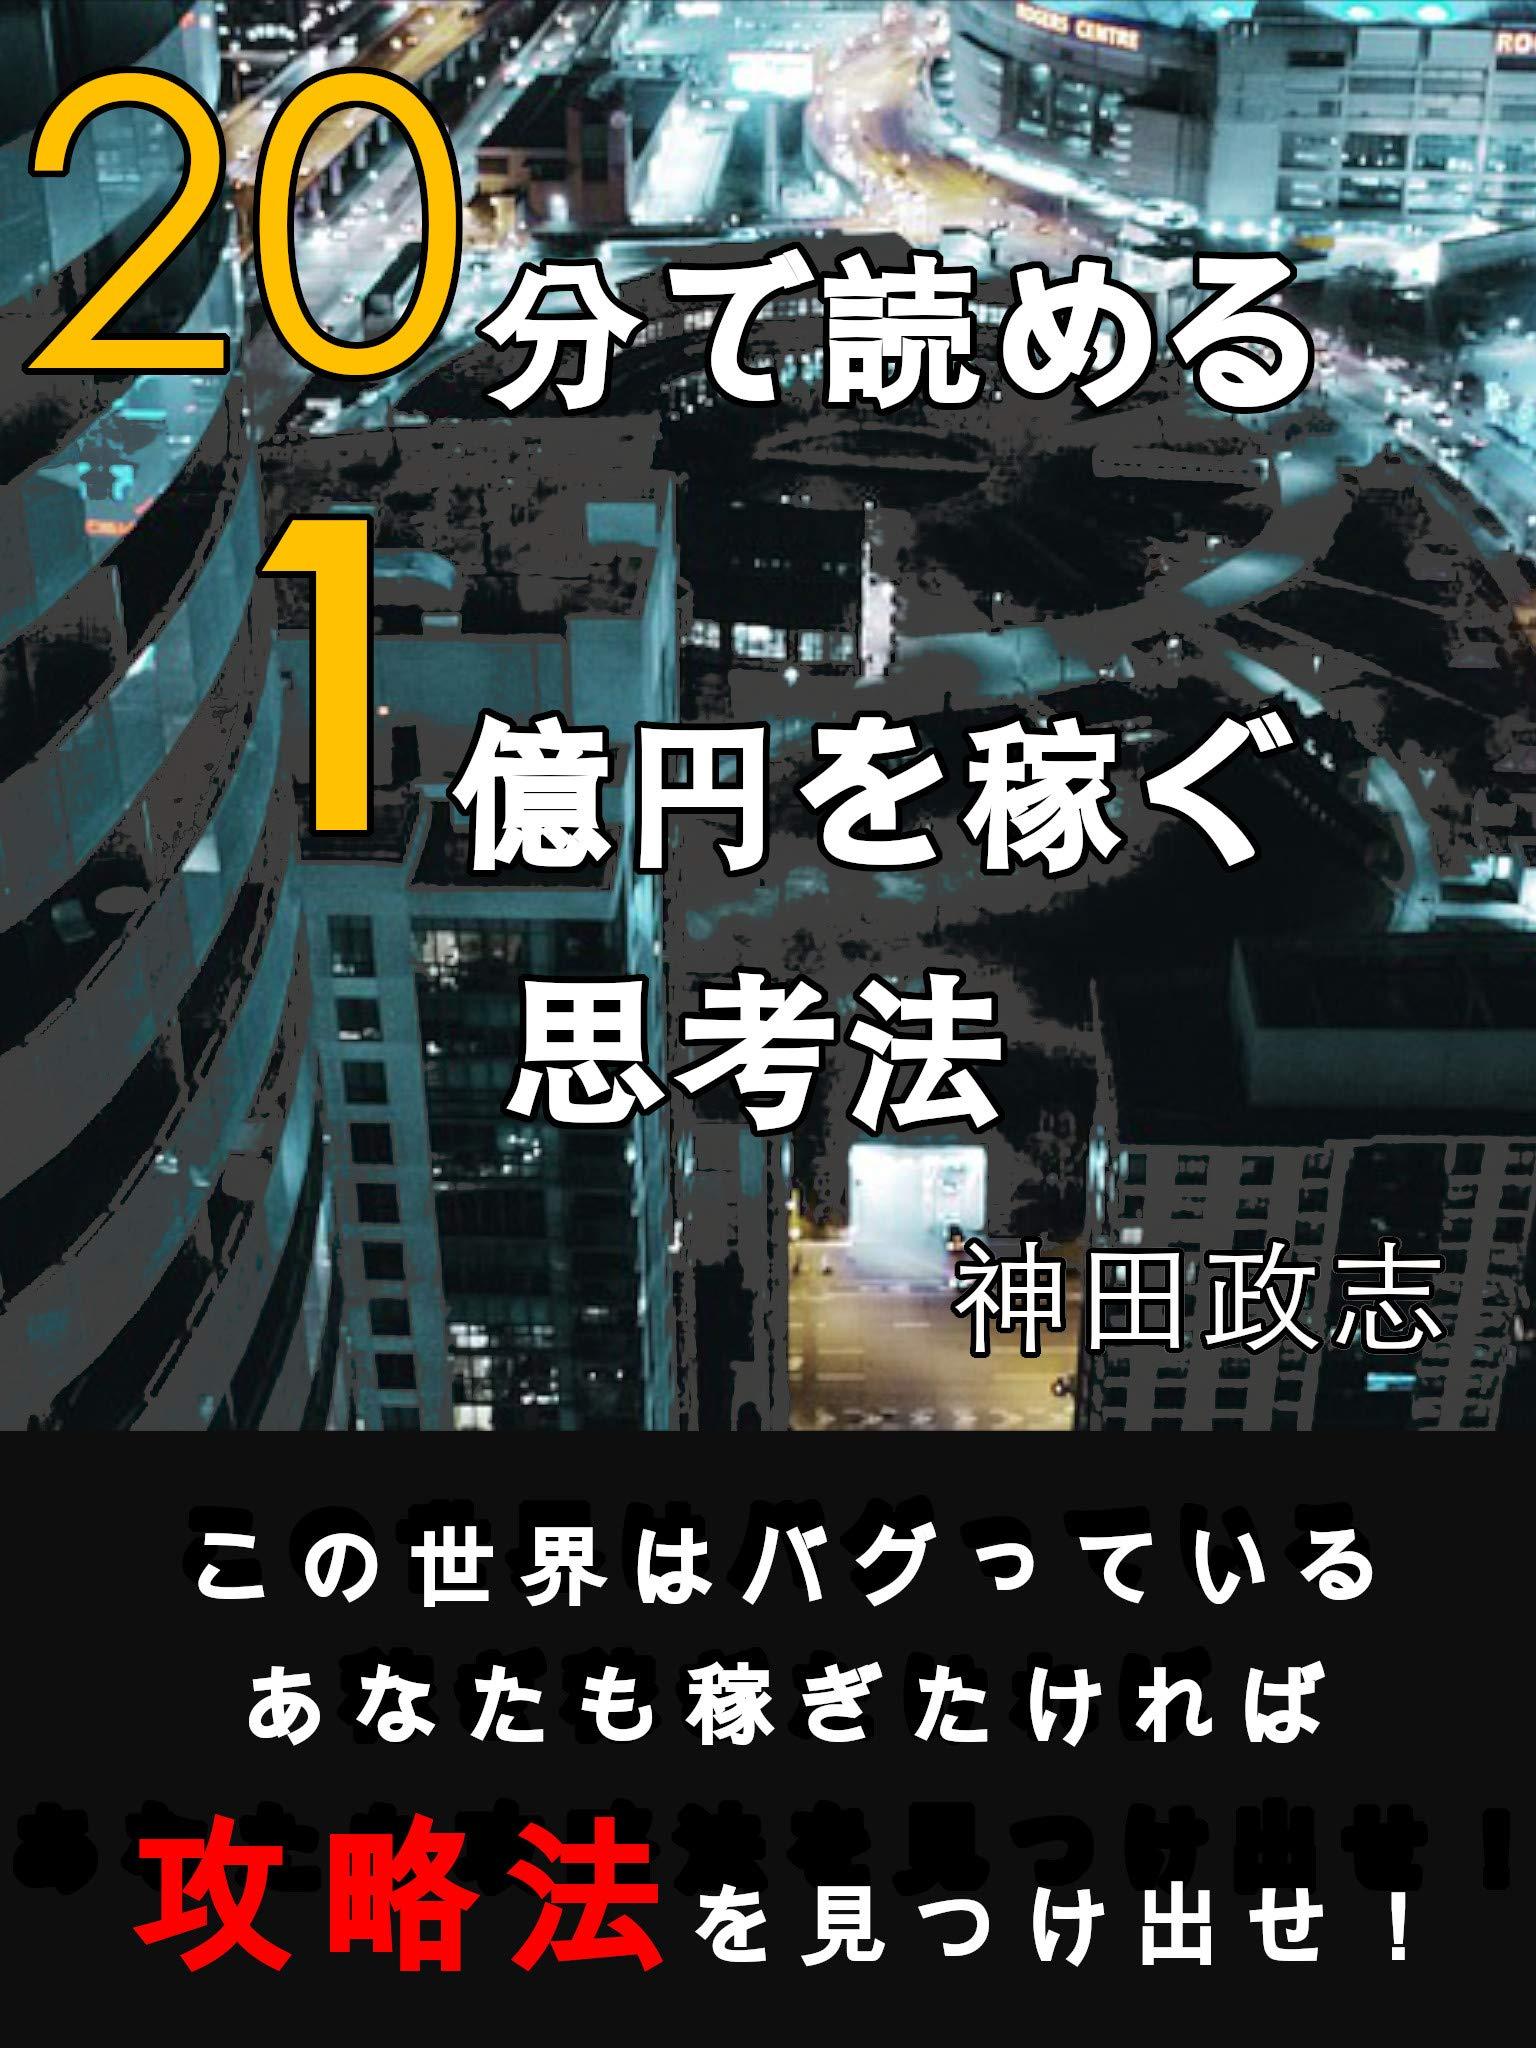 nijyuppunndeyomwru itiokuennwokasegusikouhou (Japanese Edition)